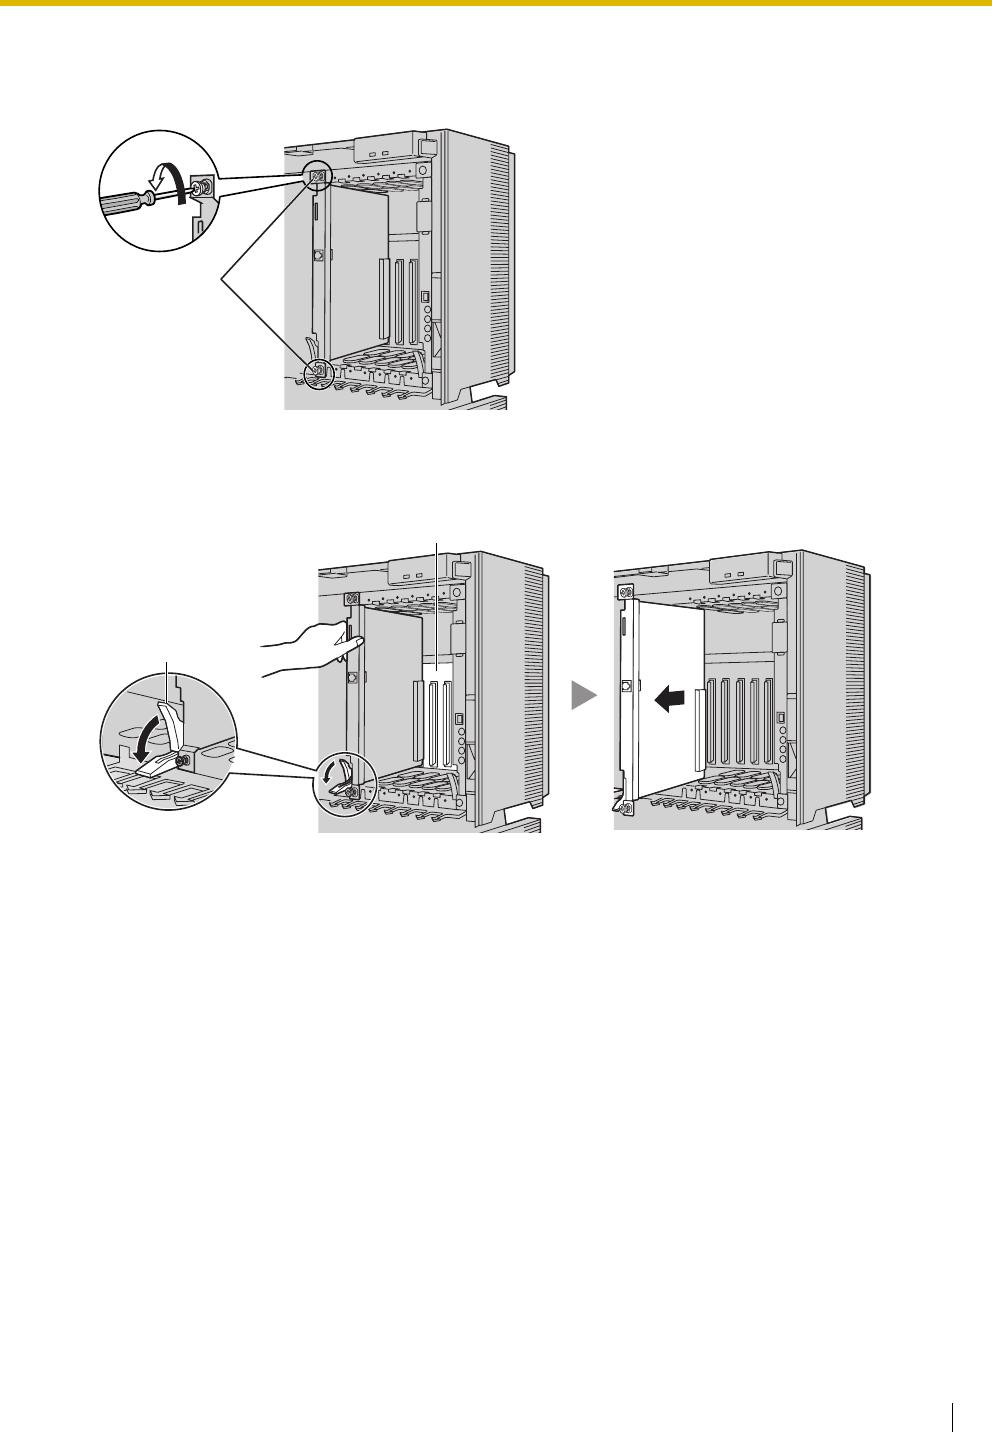 Panasonic Kx Tda100 Installation Manual User To The E8a4aadb 3 Slot Payphone Wiring Diagram 22 Of Hybrid Ip Pbx 55